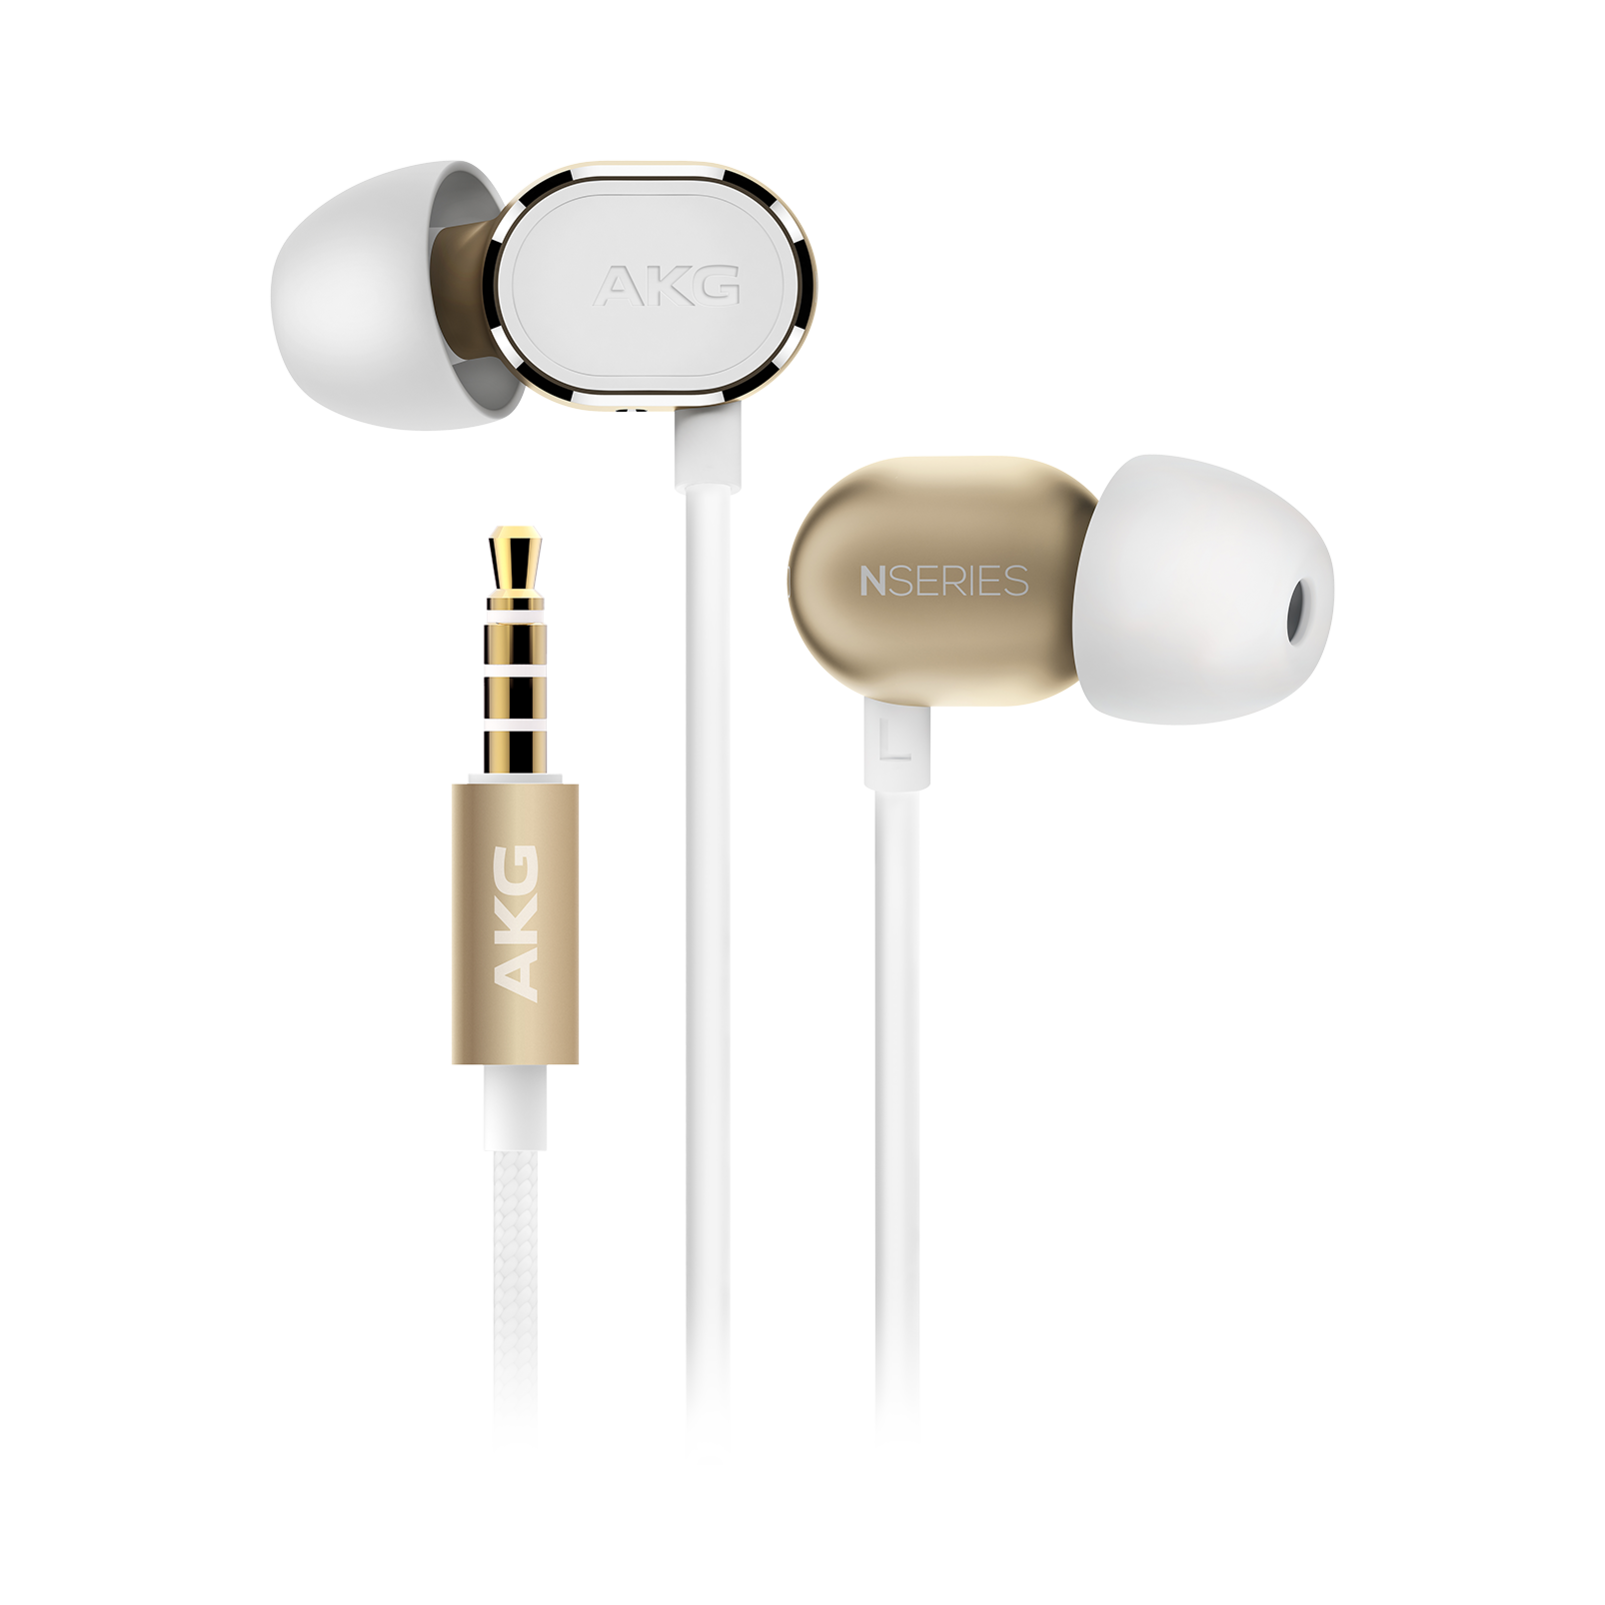 N20 - Gold - Reference class in-ear headphones in aluminum enclousure - Hero